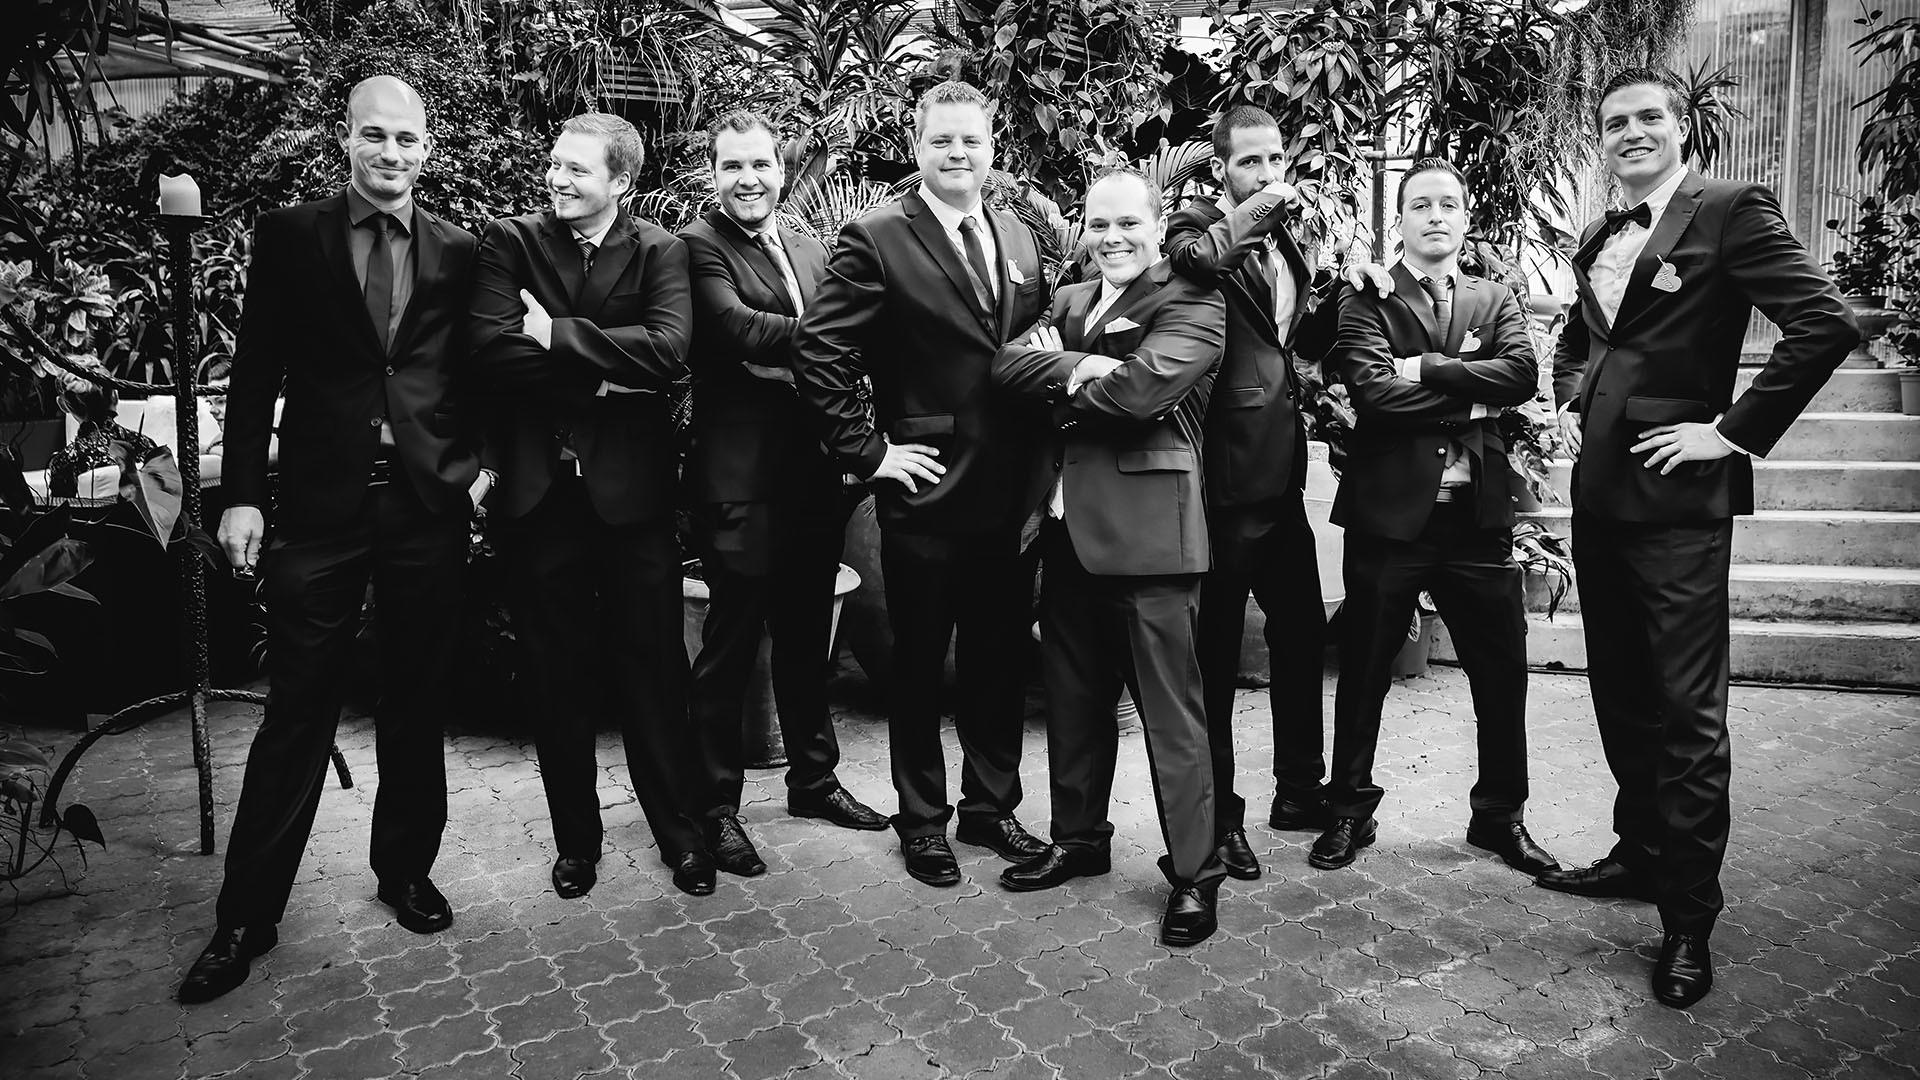 Gruppenbild Männer